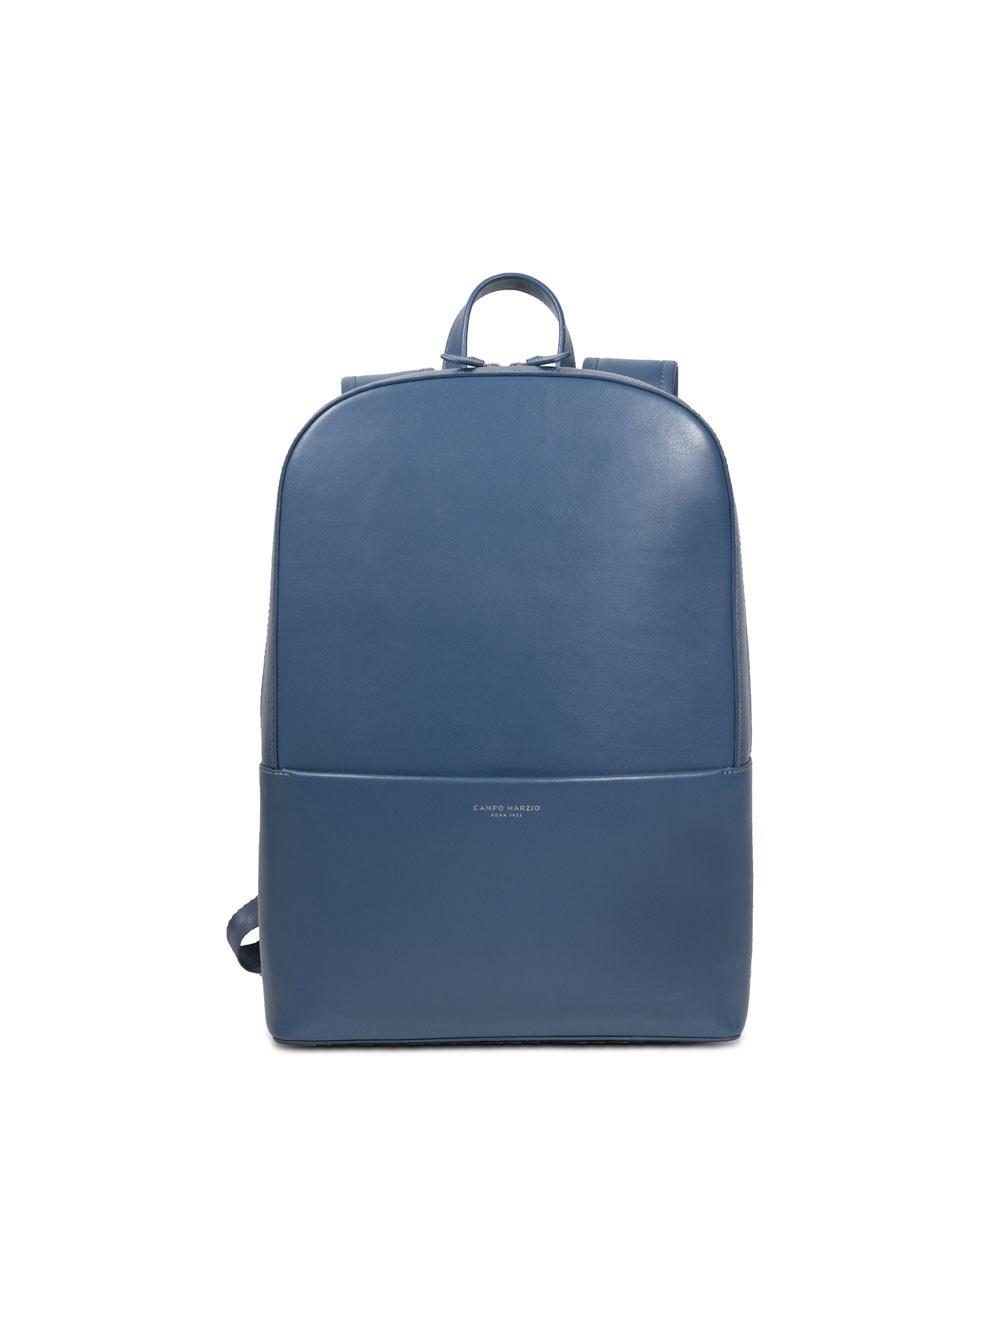 Backpack Business  - Dark Denim